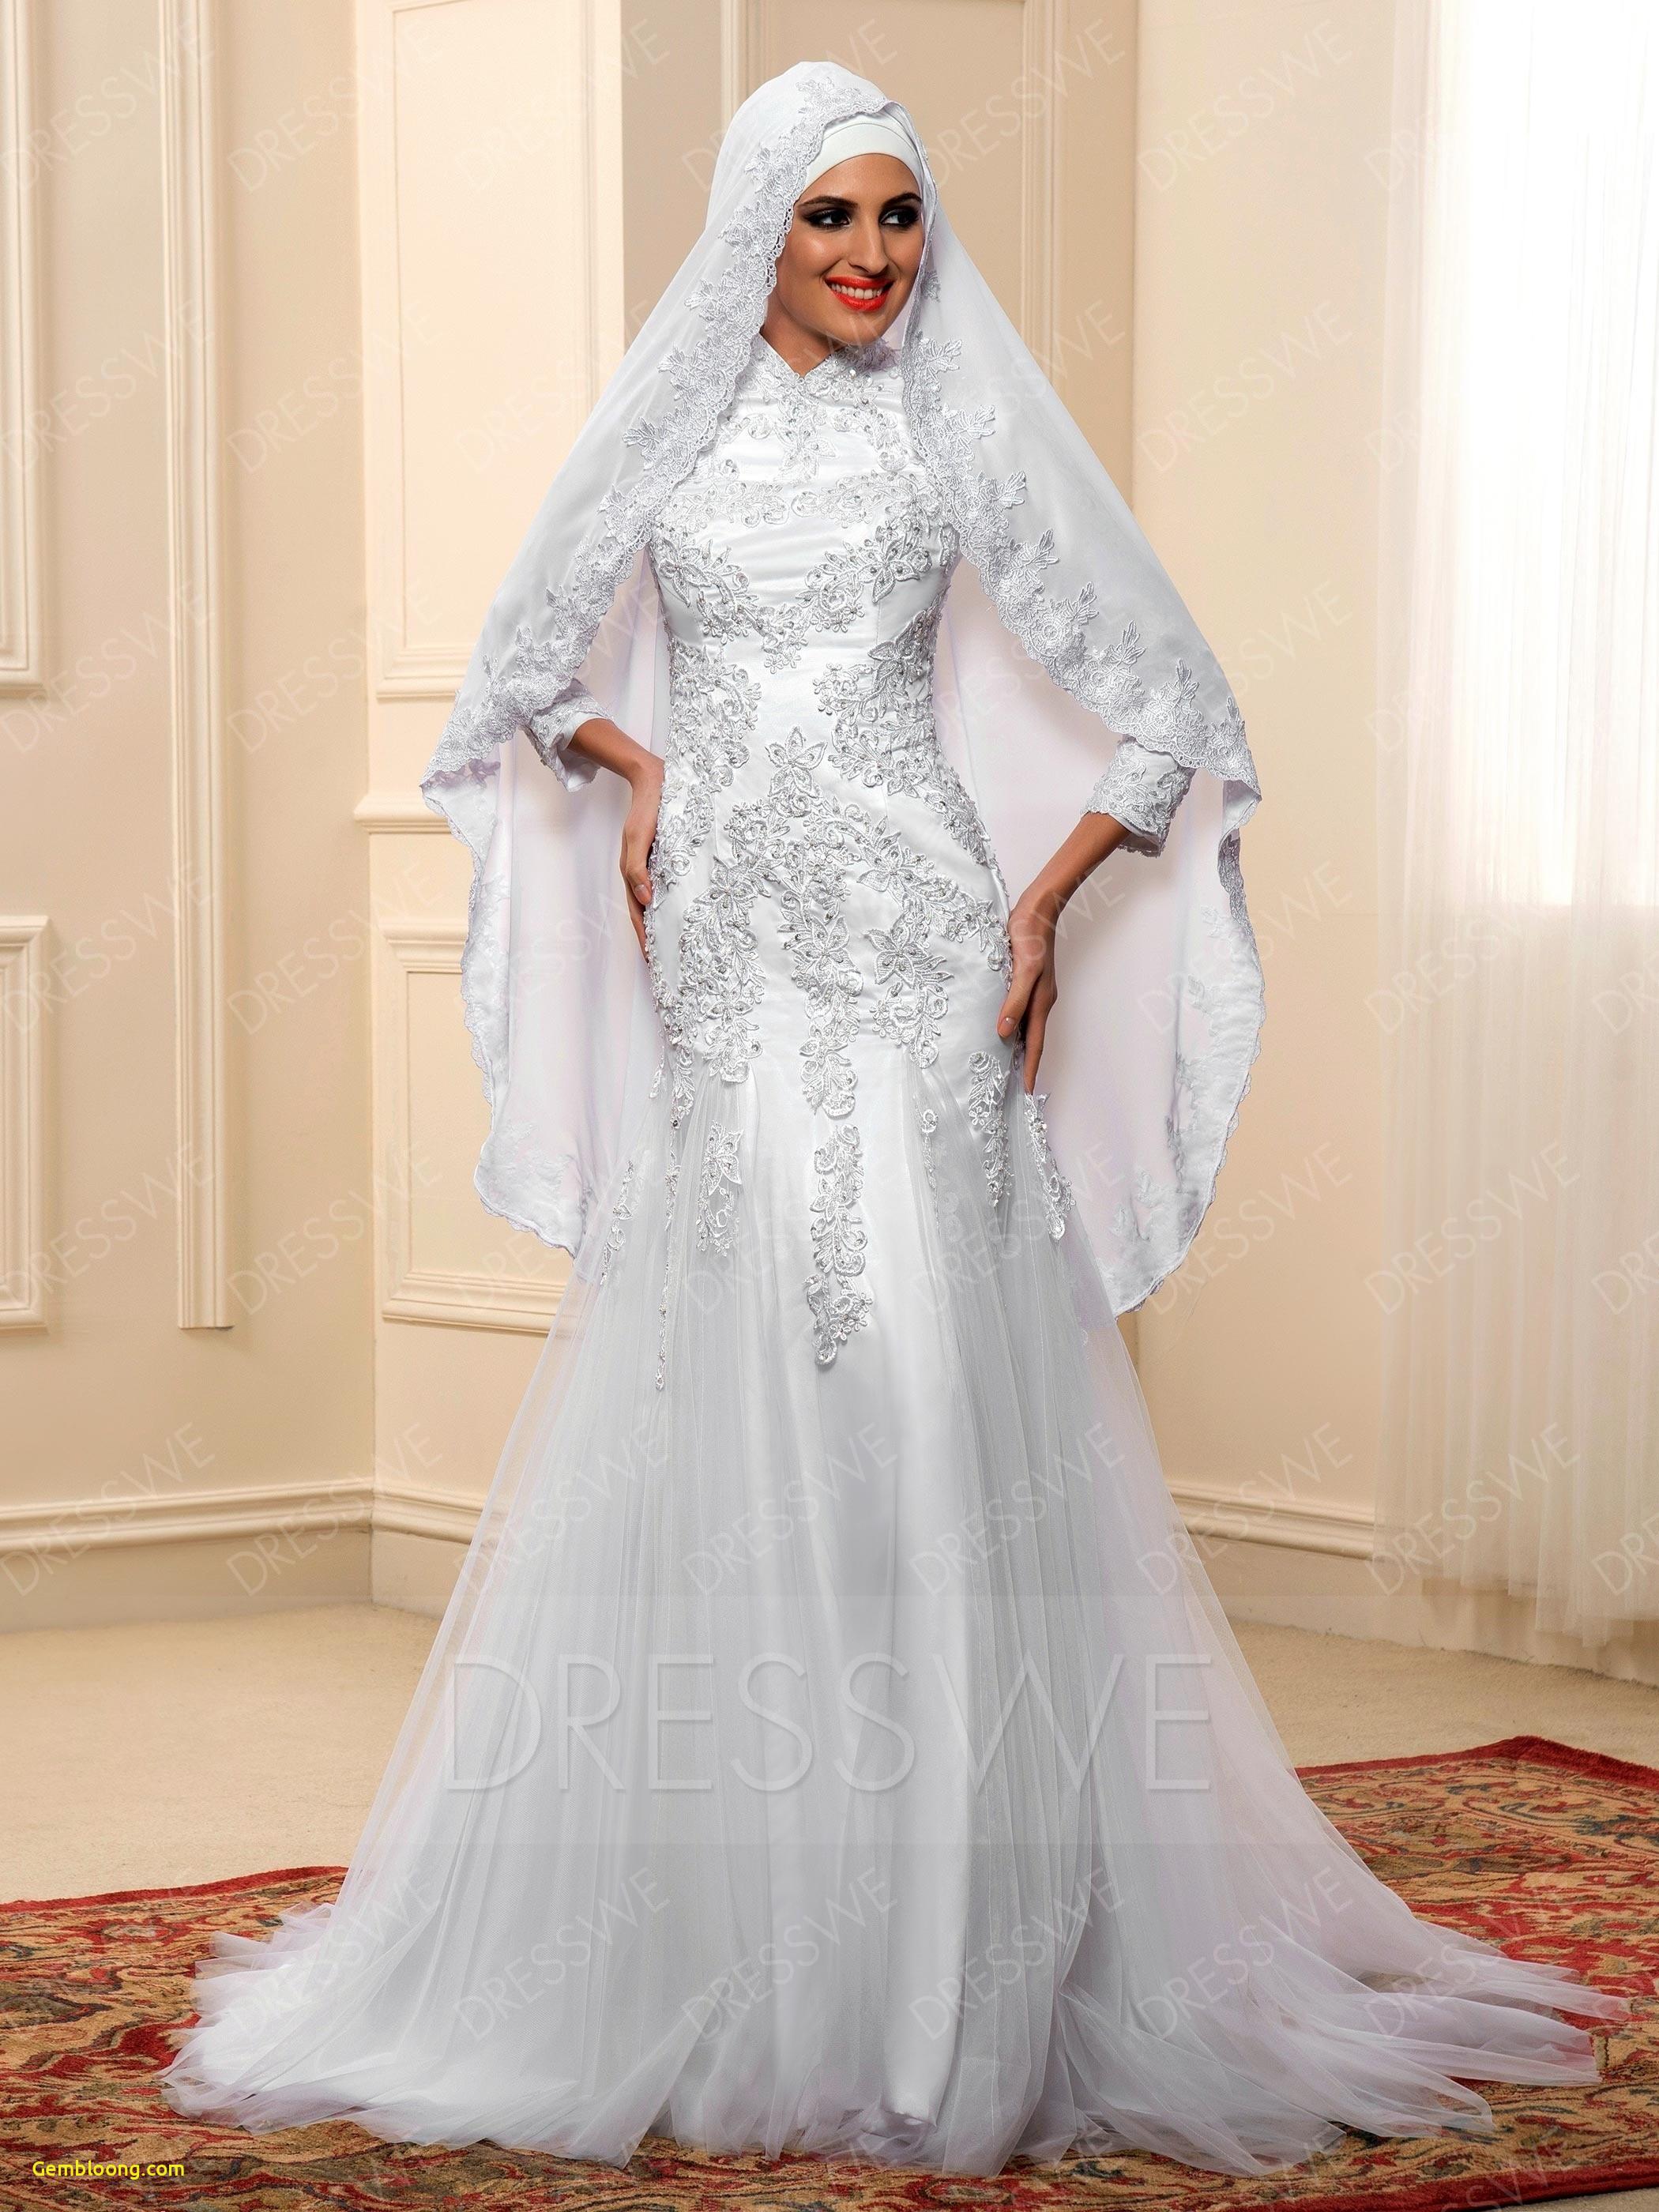 Gaun Pengantin Berhijab Fresh Baju Nikah Muslim Cantik Mewah Gaun Pengantin Berhijab